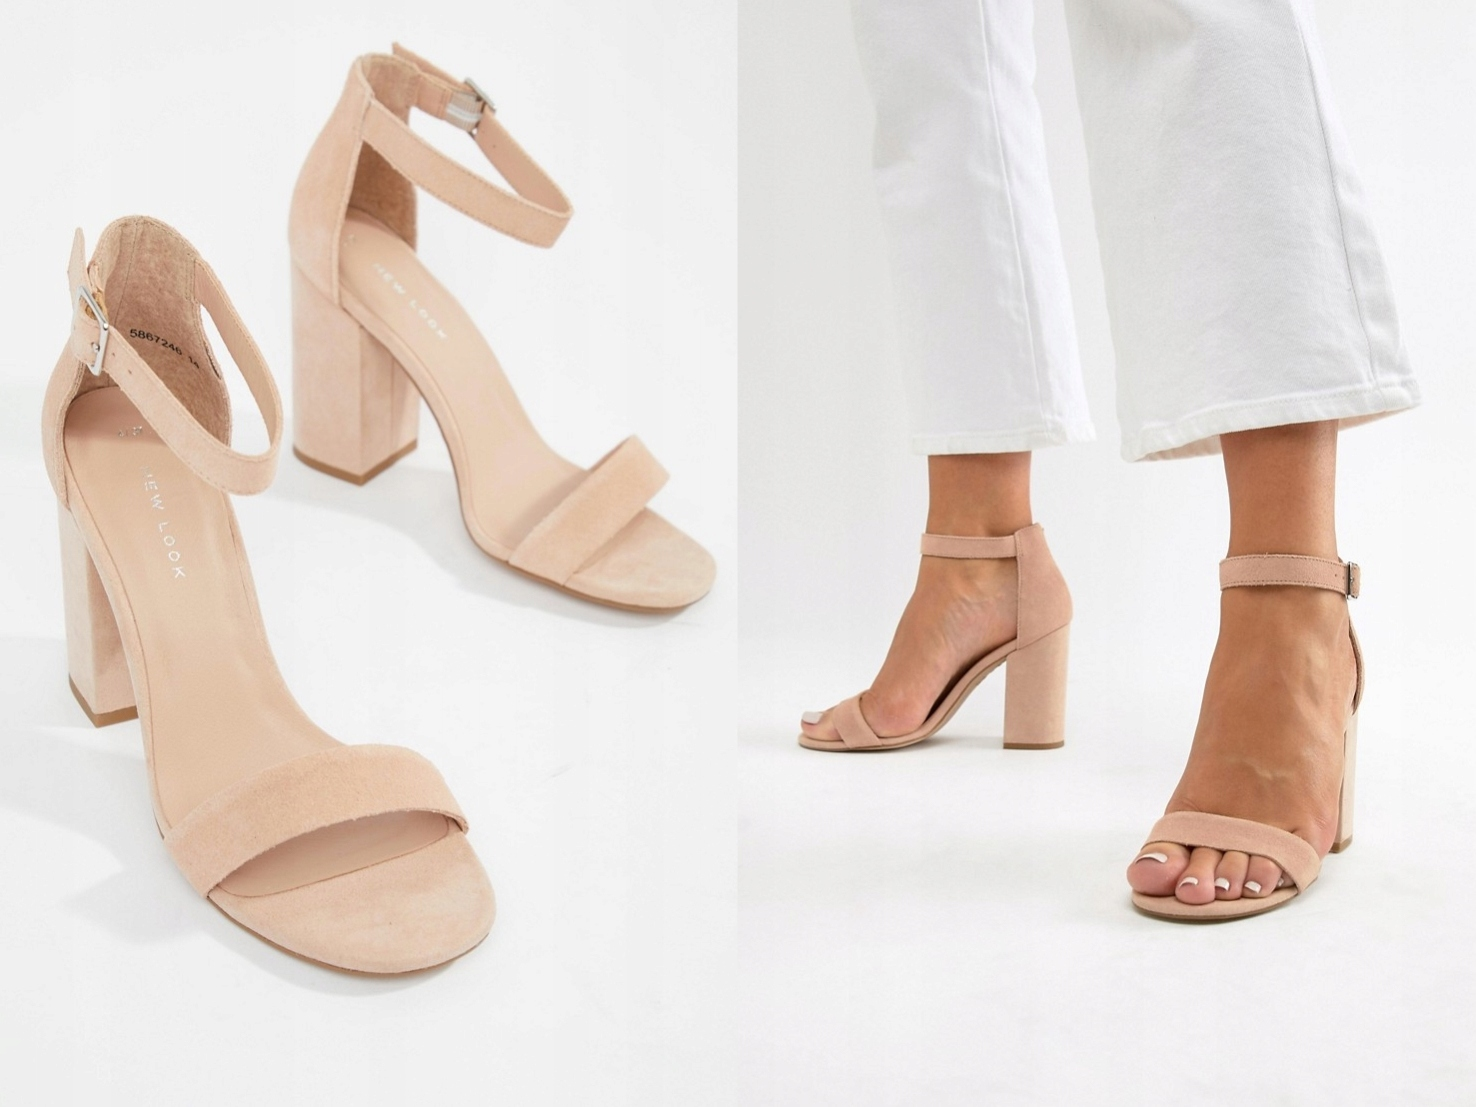 New Look - Sandały Na Klocku Nude - 41